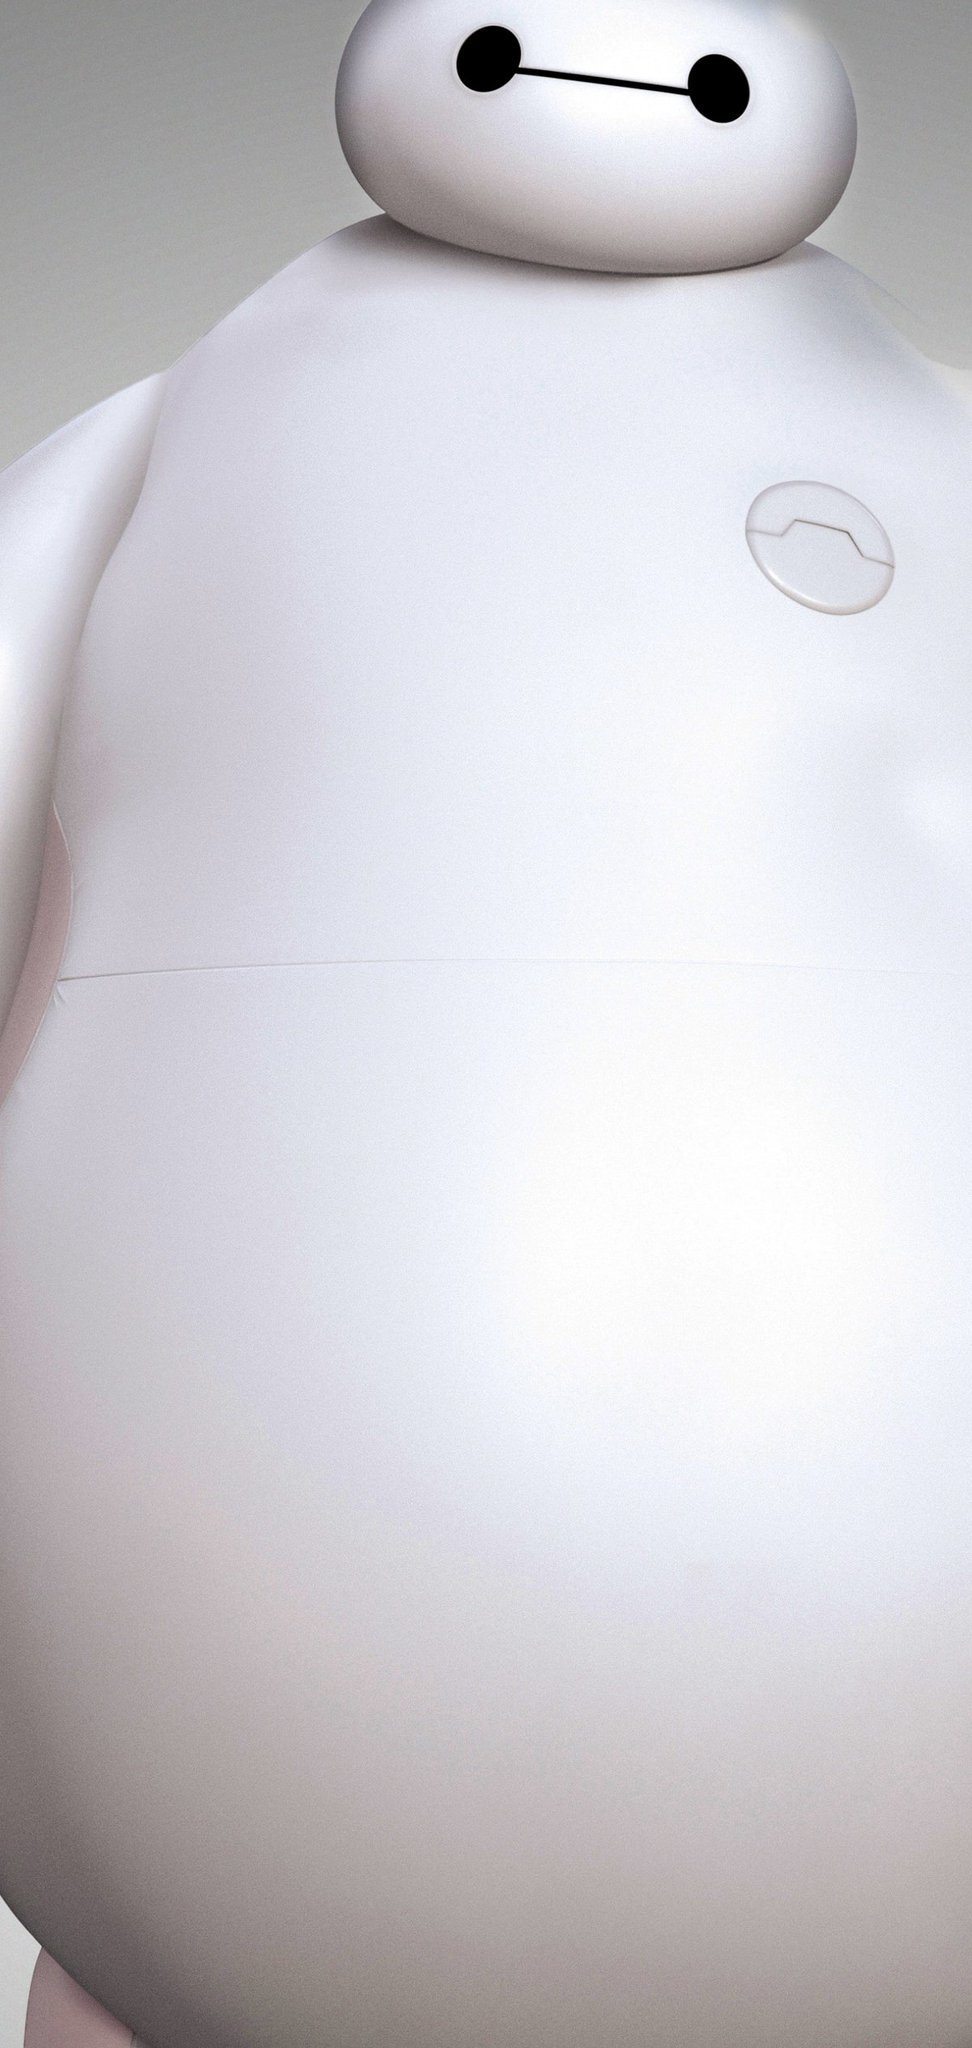 Galaxy Note 10 fond écran